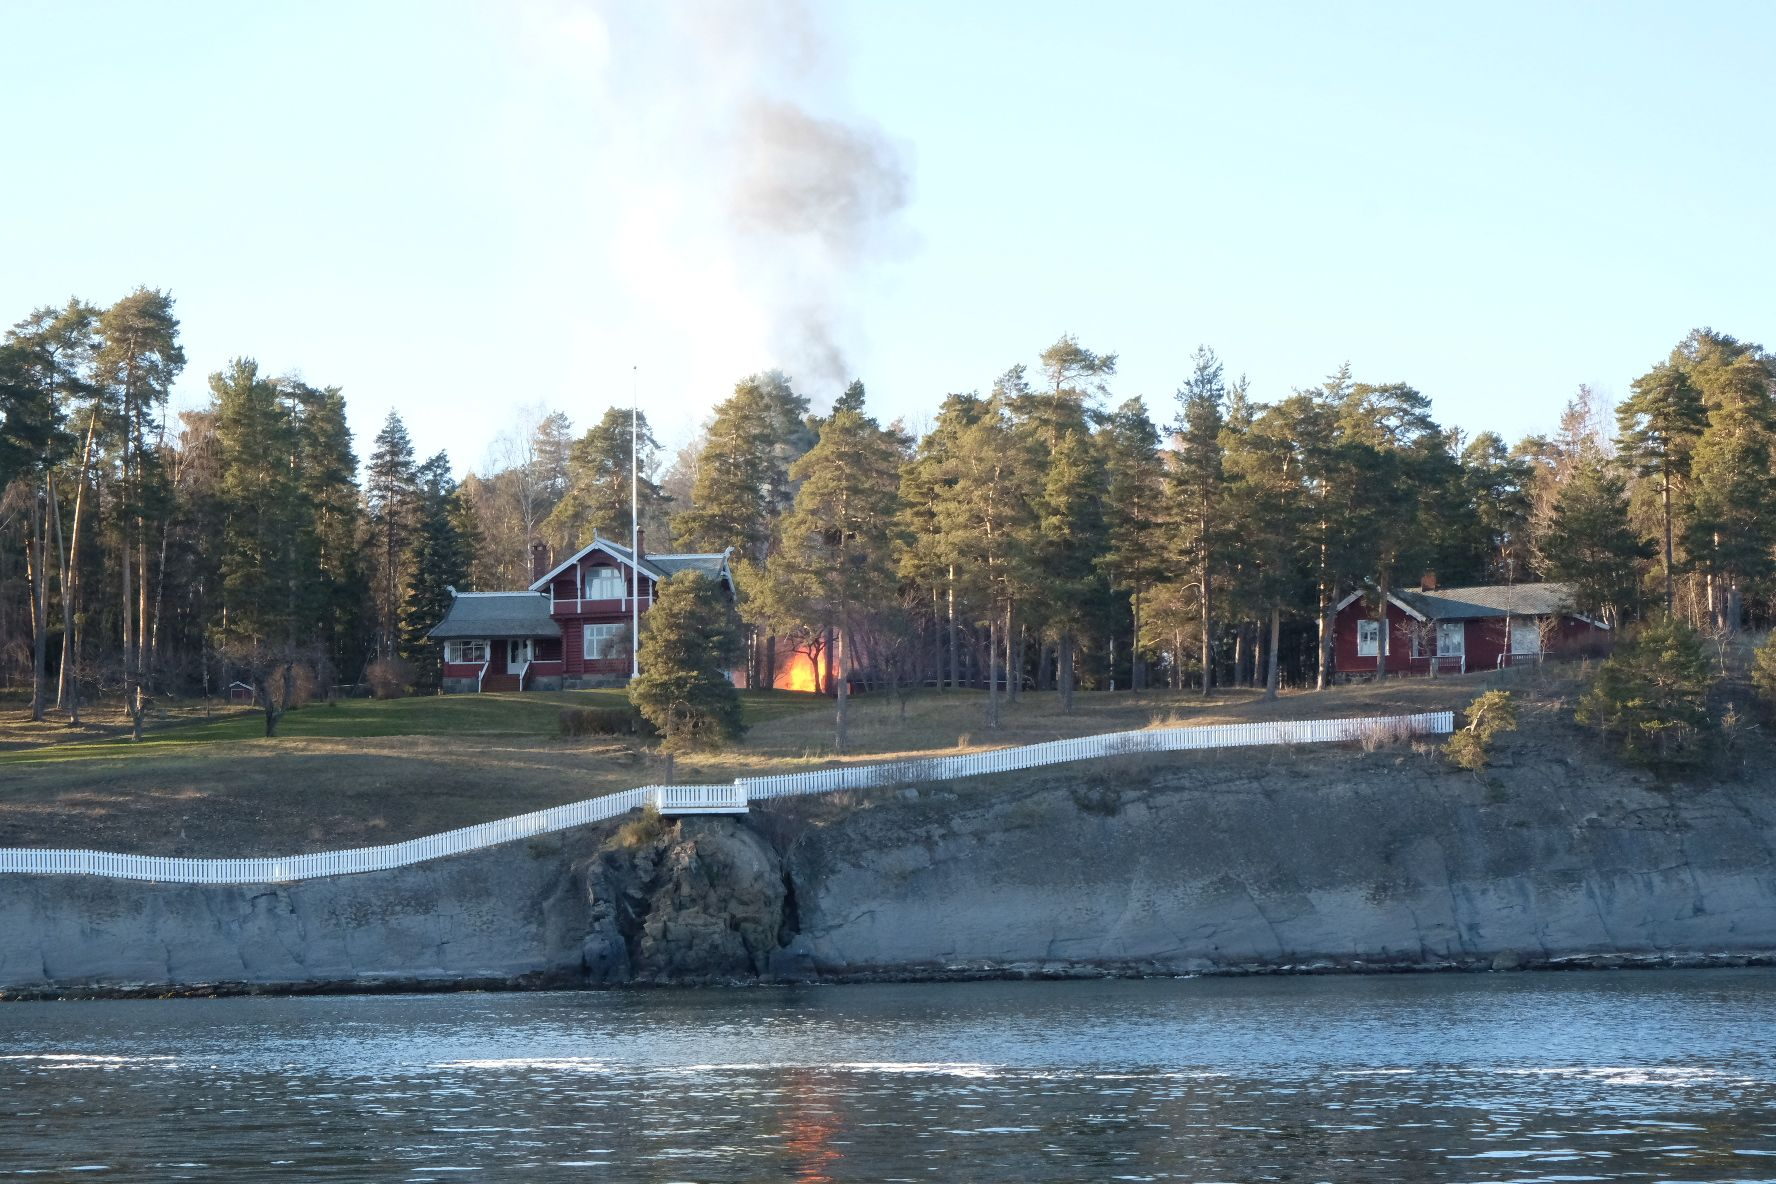 BÆRUM: Det brant på Grimsøya i Bærum lørdag ettermiddag.